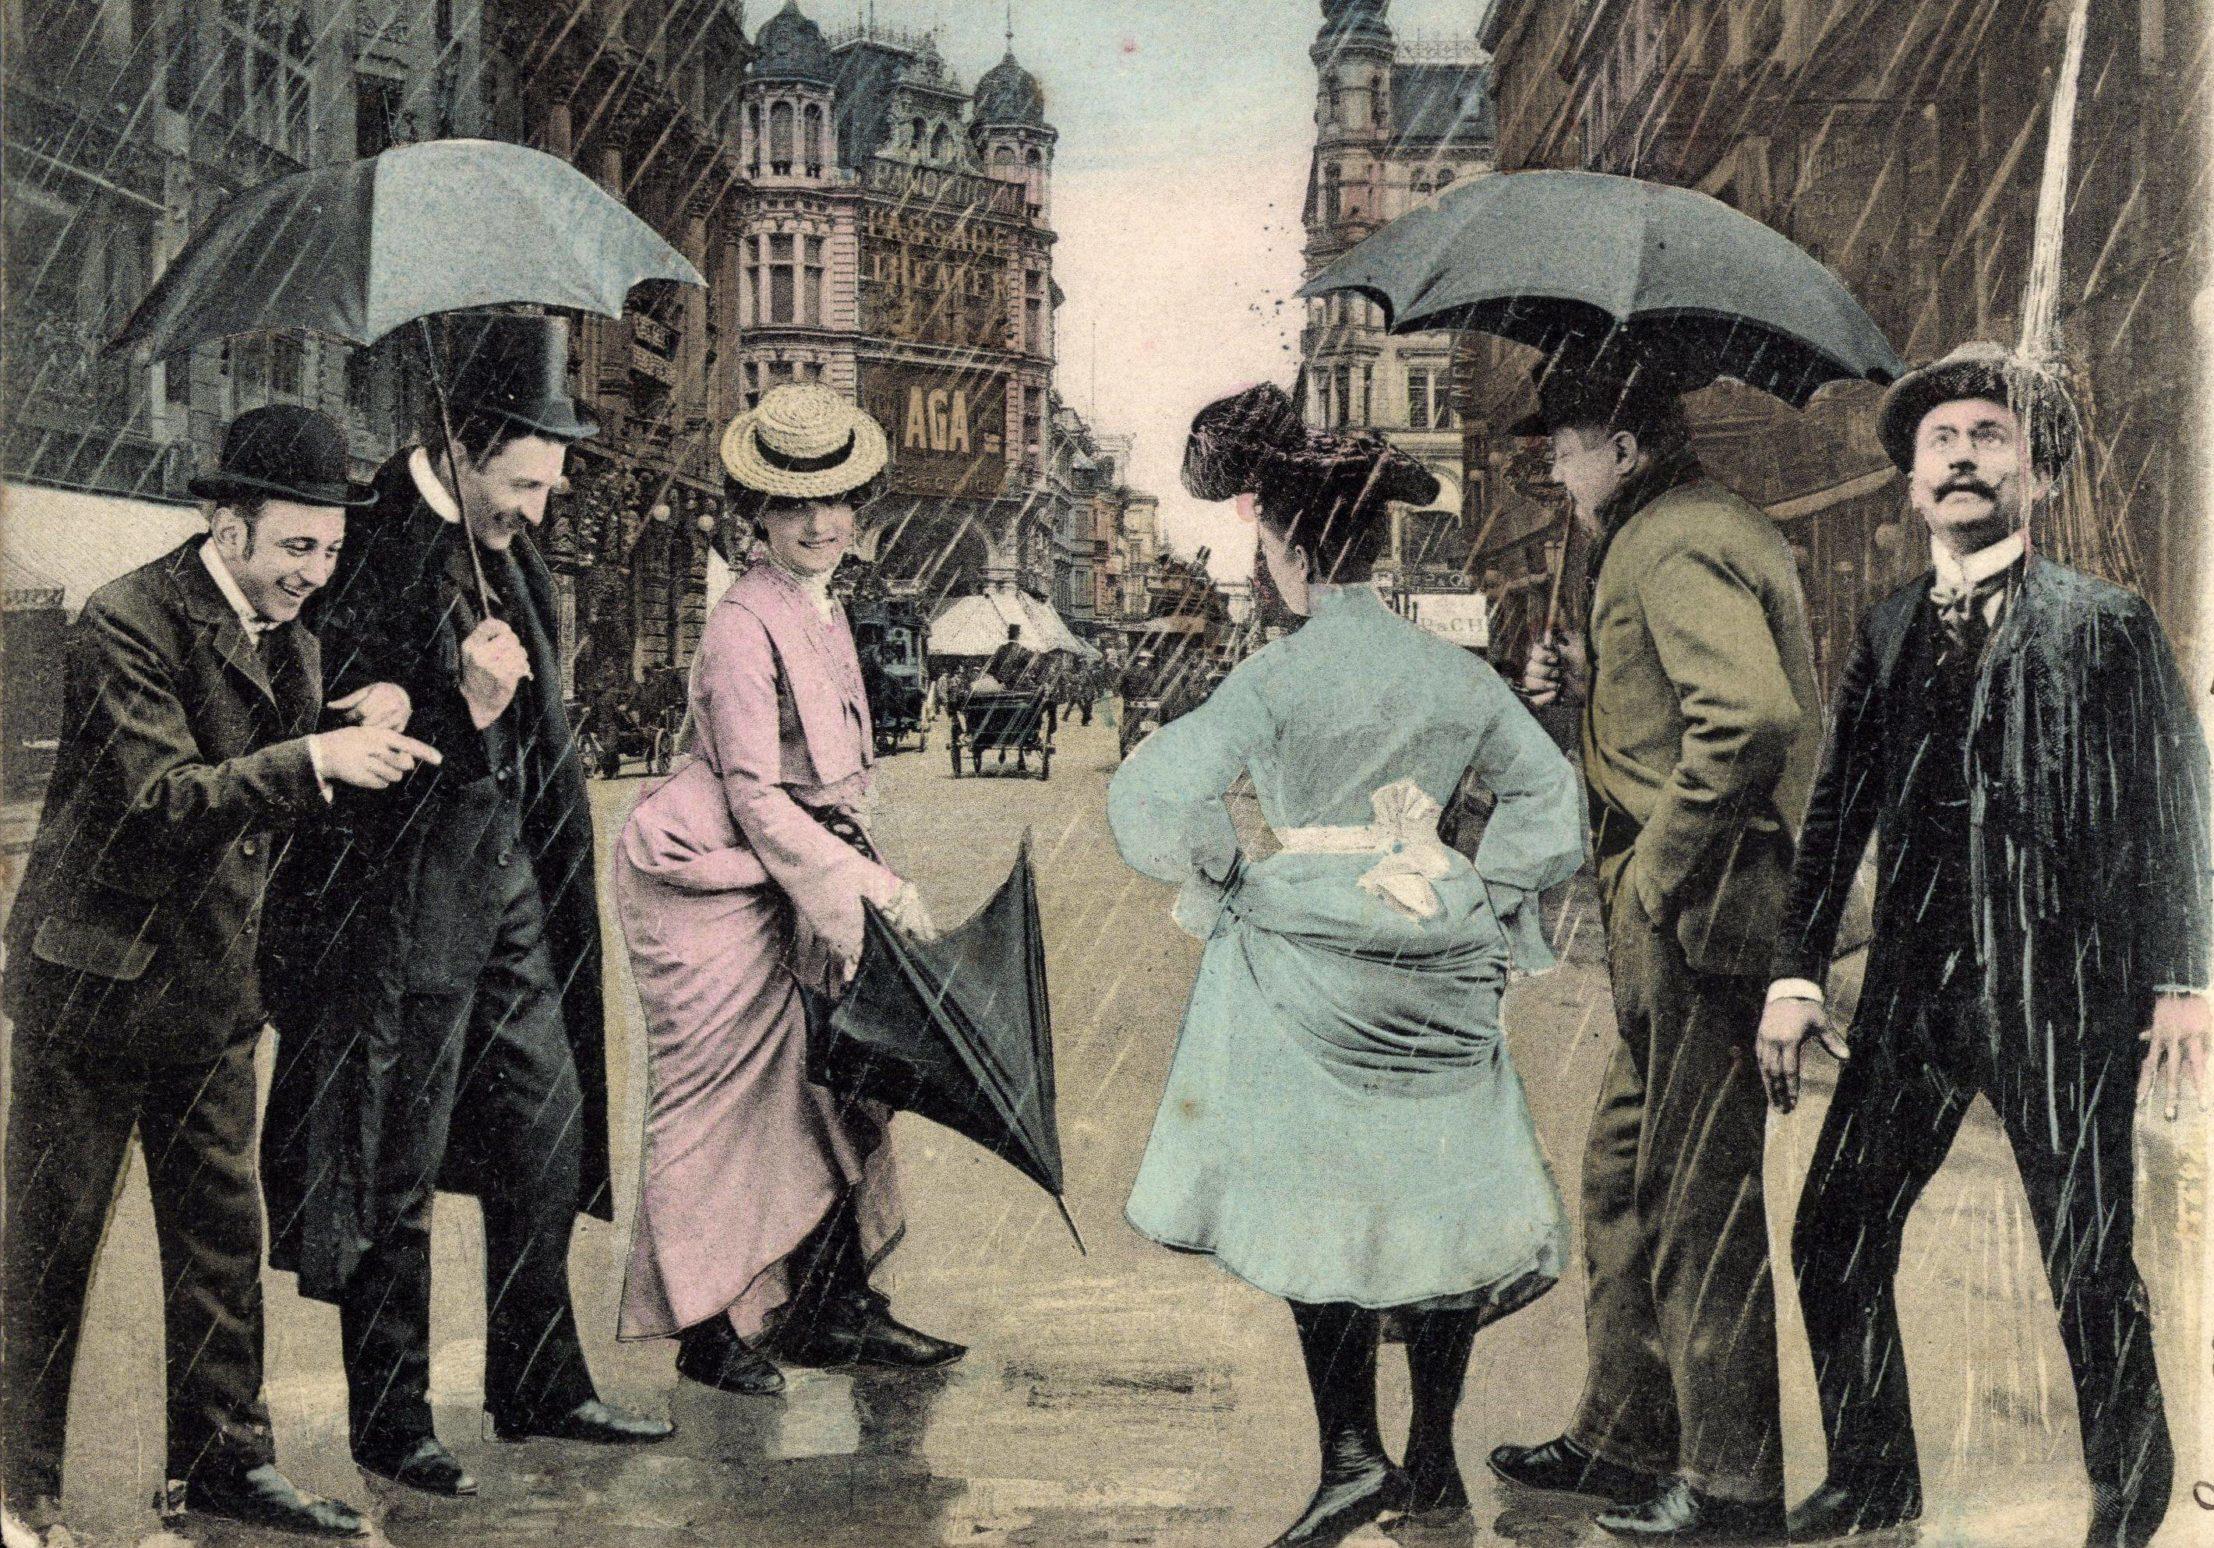 Regen in Berlin: Passanten in der Friedrichstraße, Collage um 1900. Foto: Imago/Arkivi